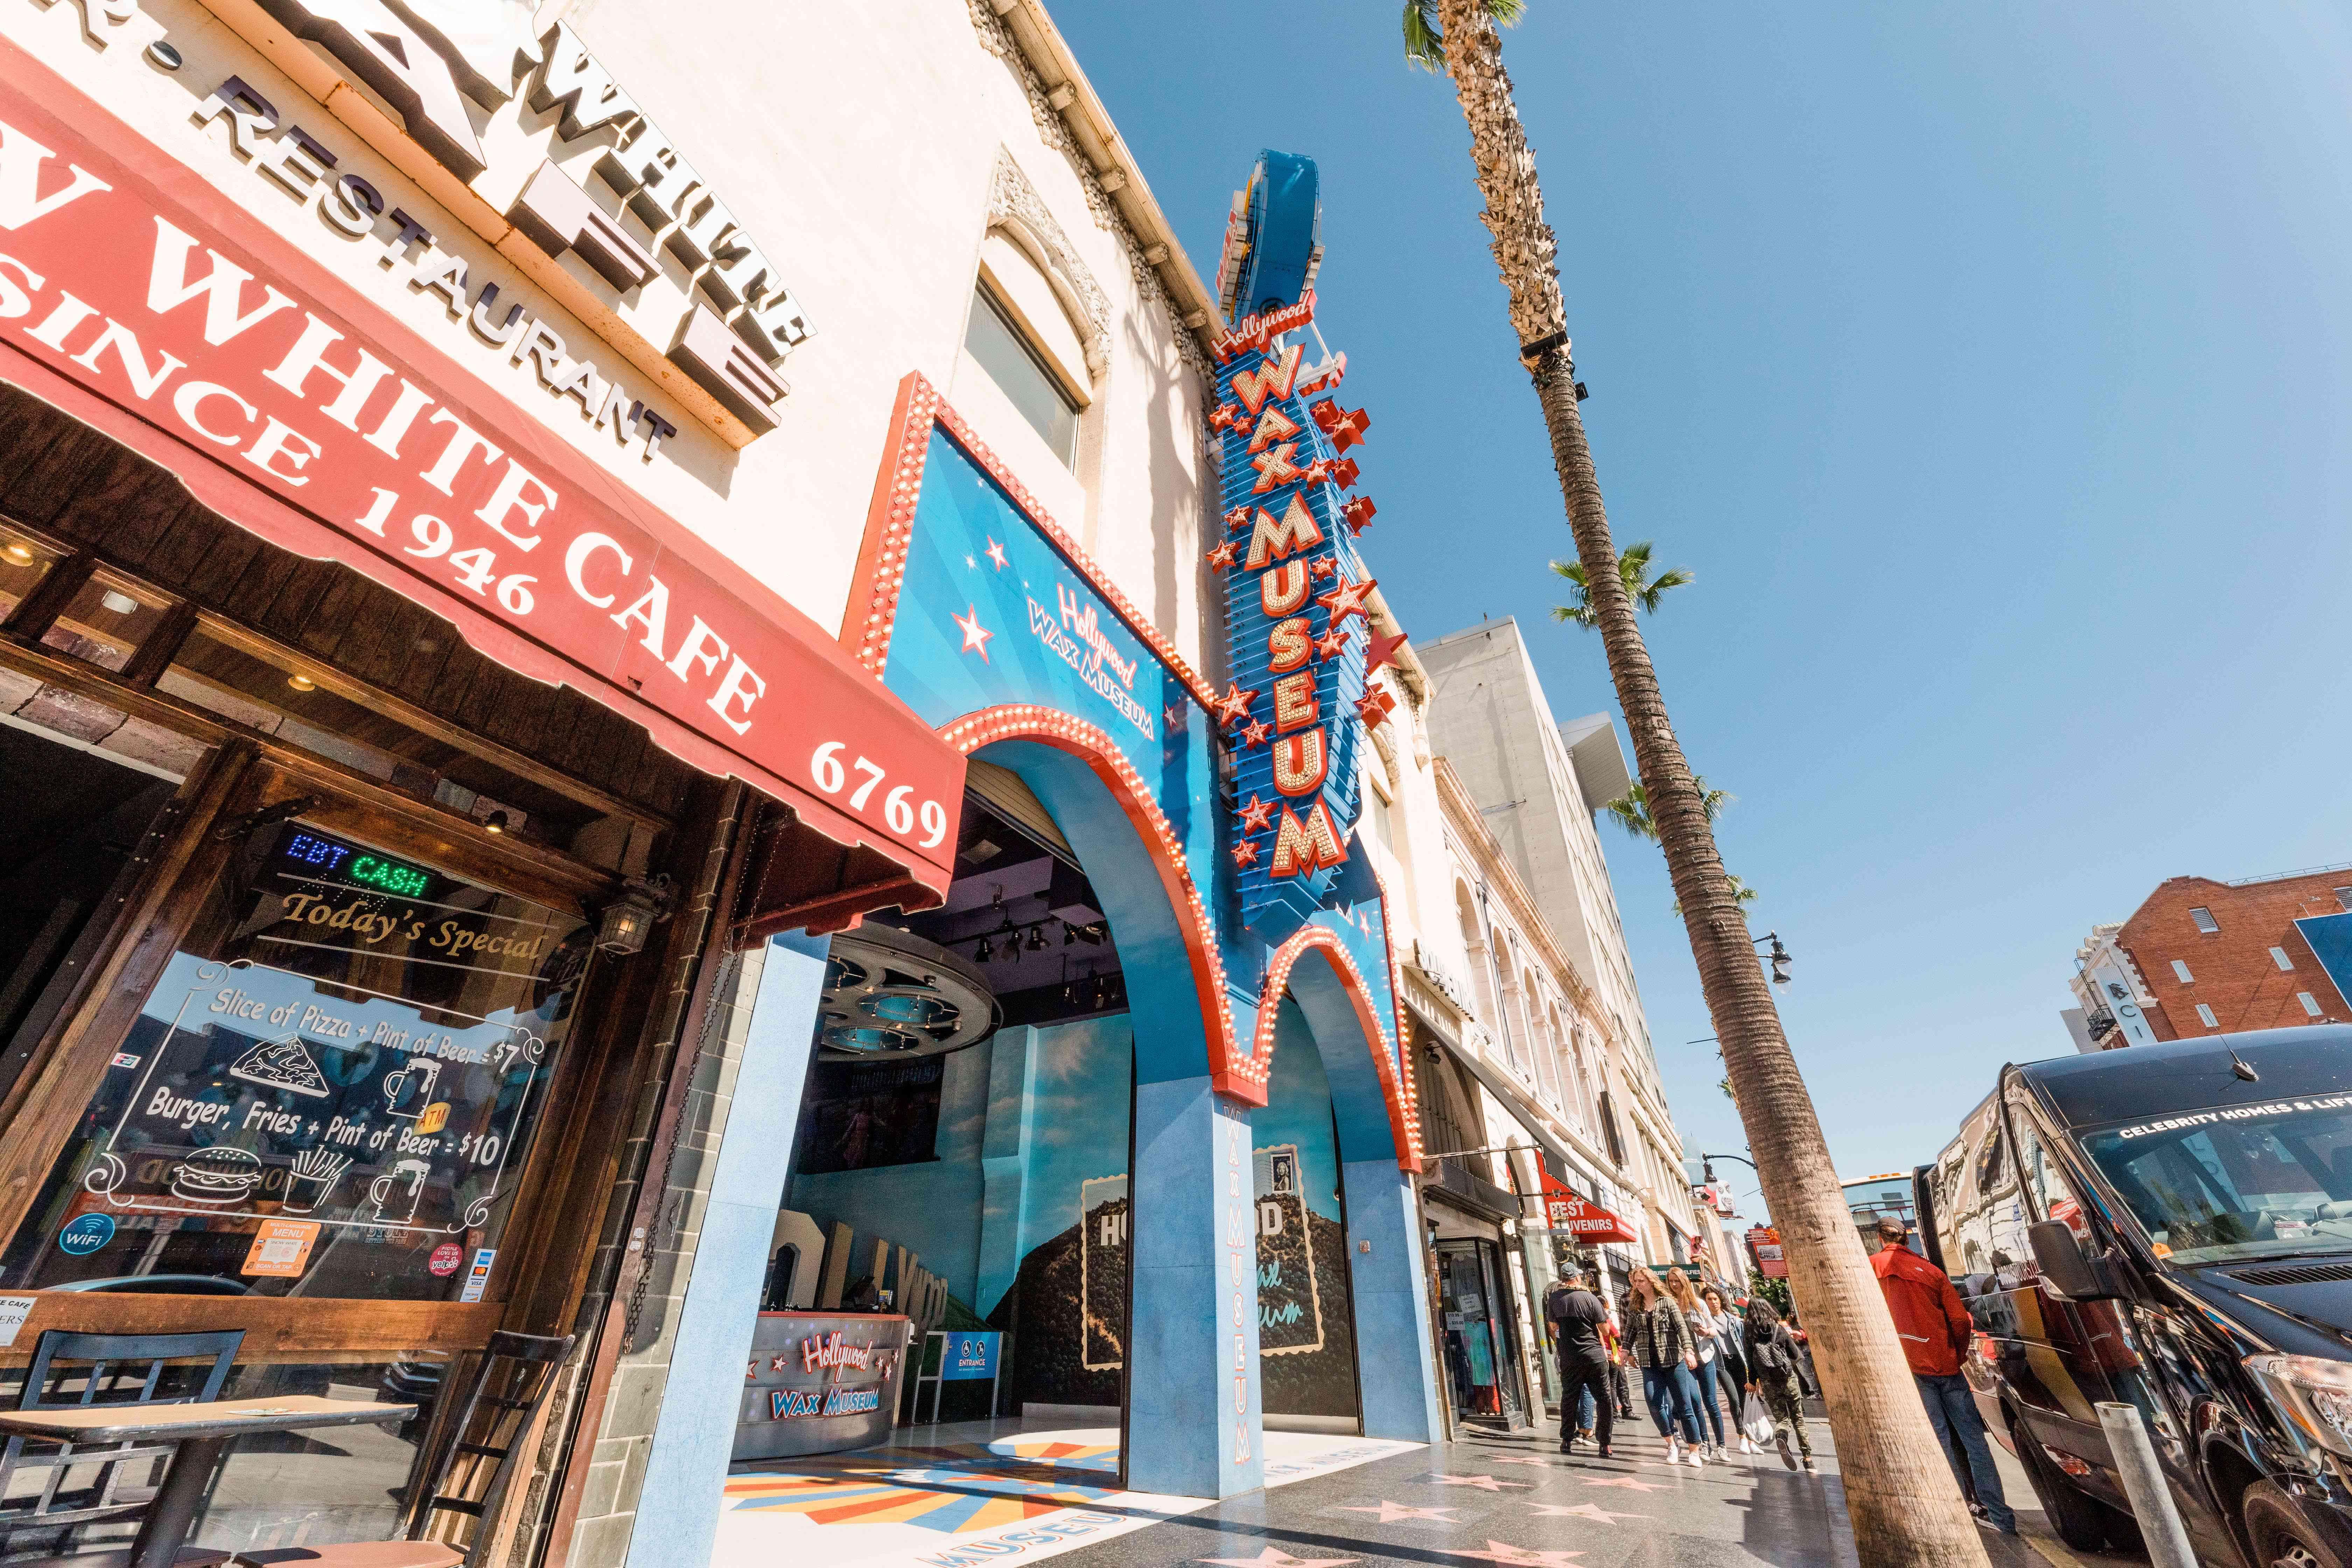 Hollywood Wax Museum in LA